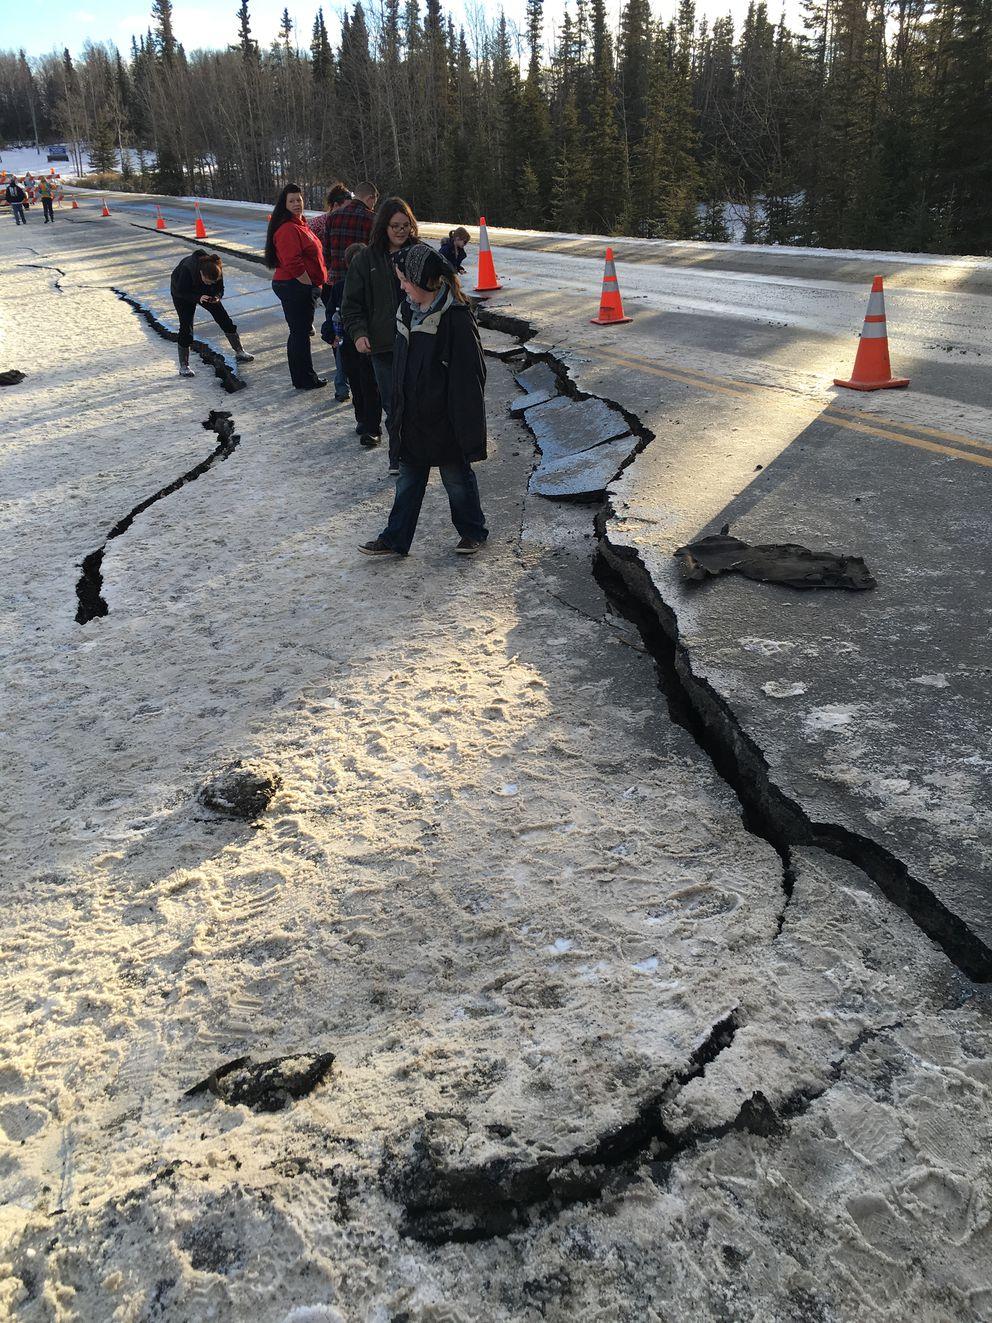 Kalifornsky Beach Road was heavily damaged near Kasilof after the magnitude-7.1 earthquake early Jan. 24, 2016. (Bob Hallinen / Alaska Dispatch News)